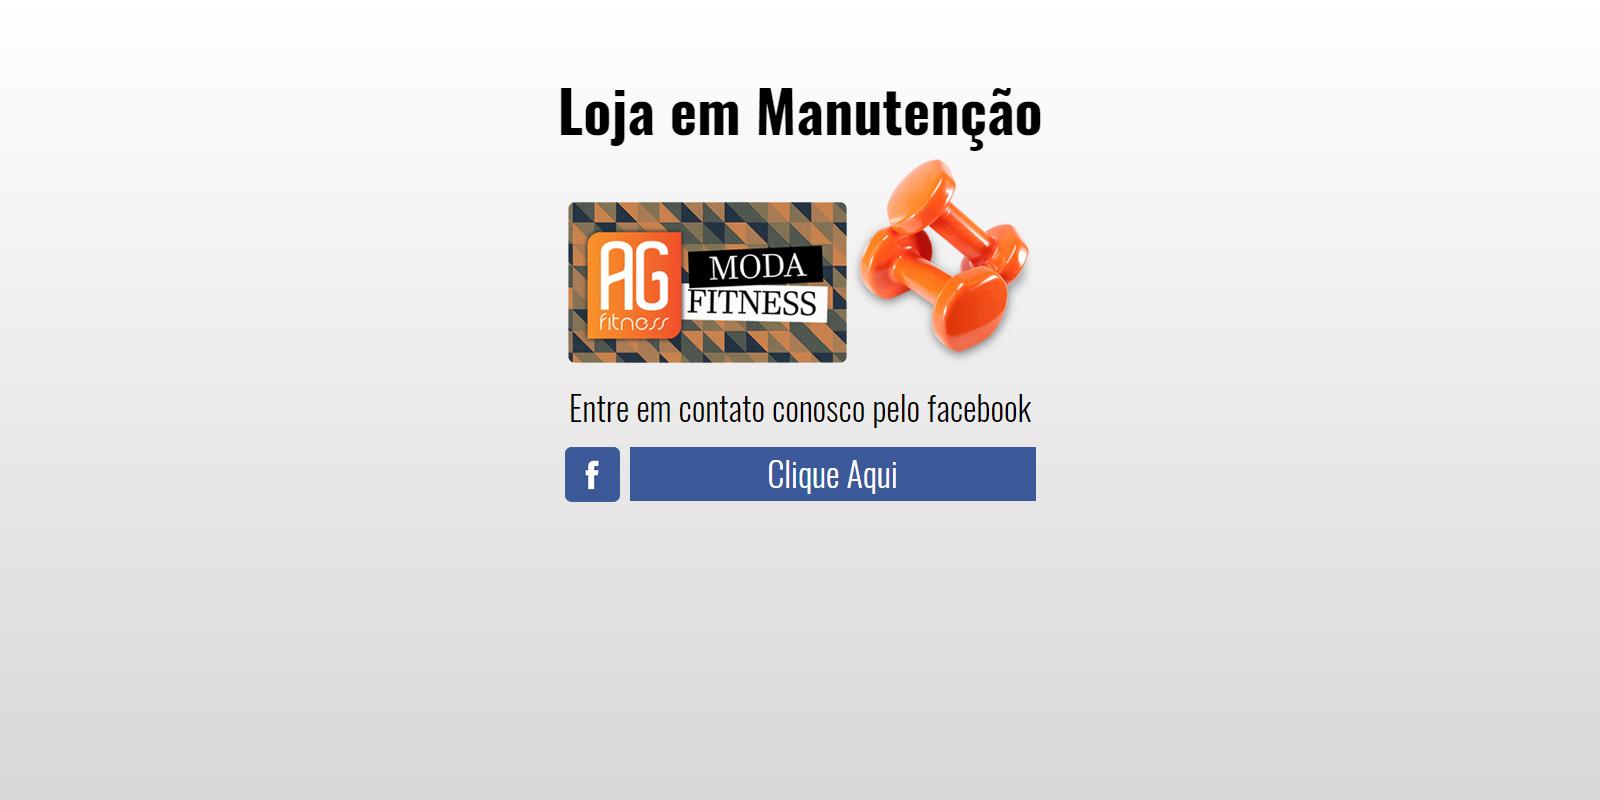 Páginas de Abertura - Lojas Virtuais BR